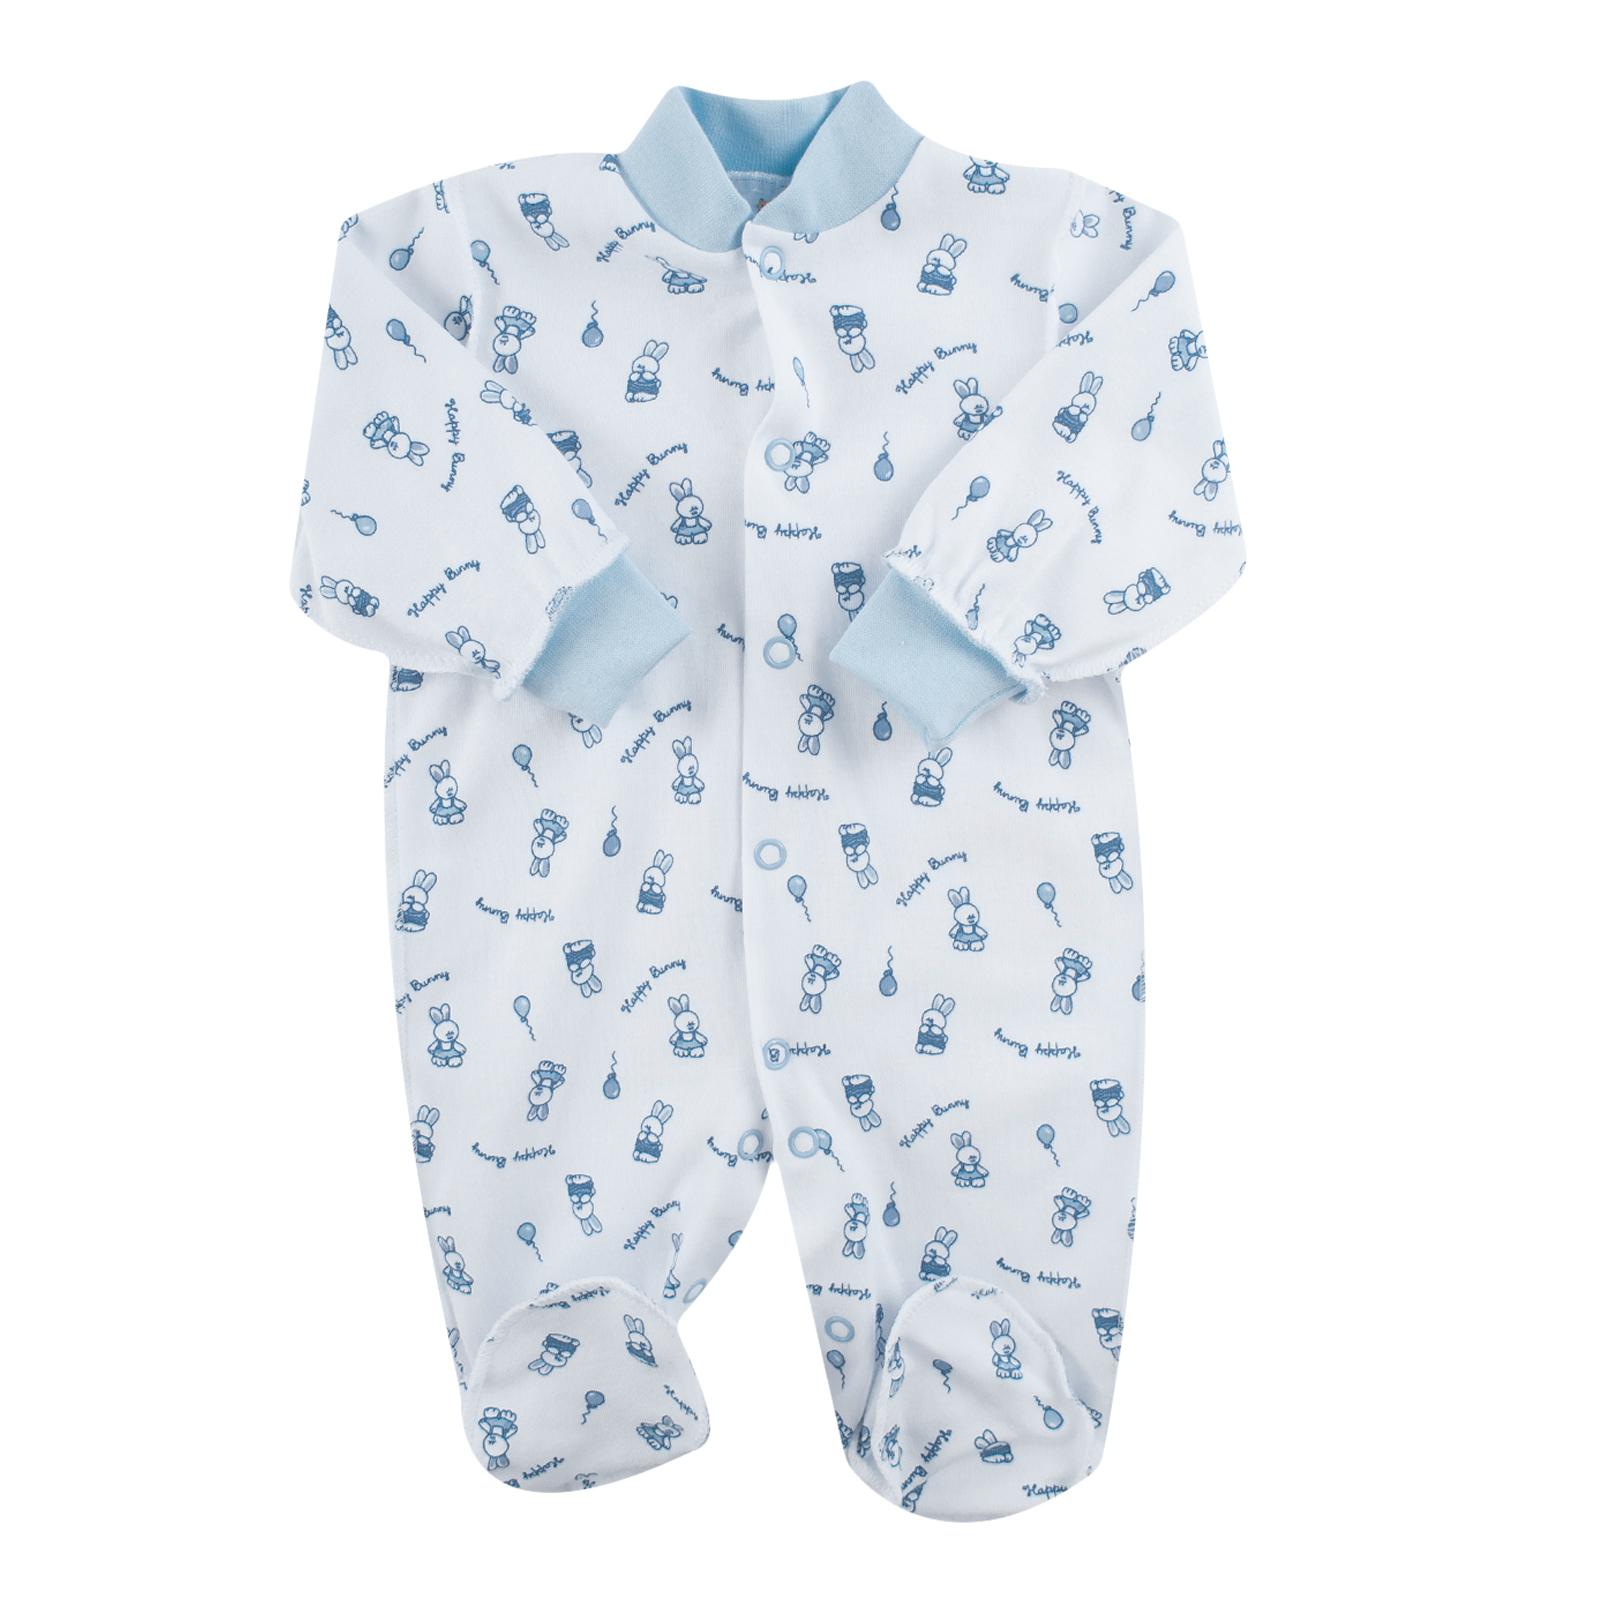 Комбинезон КОТМАРКОТ для мальчика, цвет набивка голубой тон 0-1 мес (размер 50)